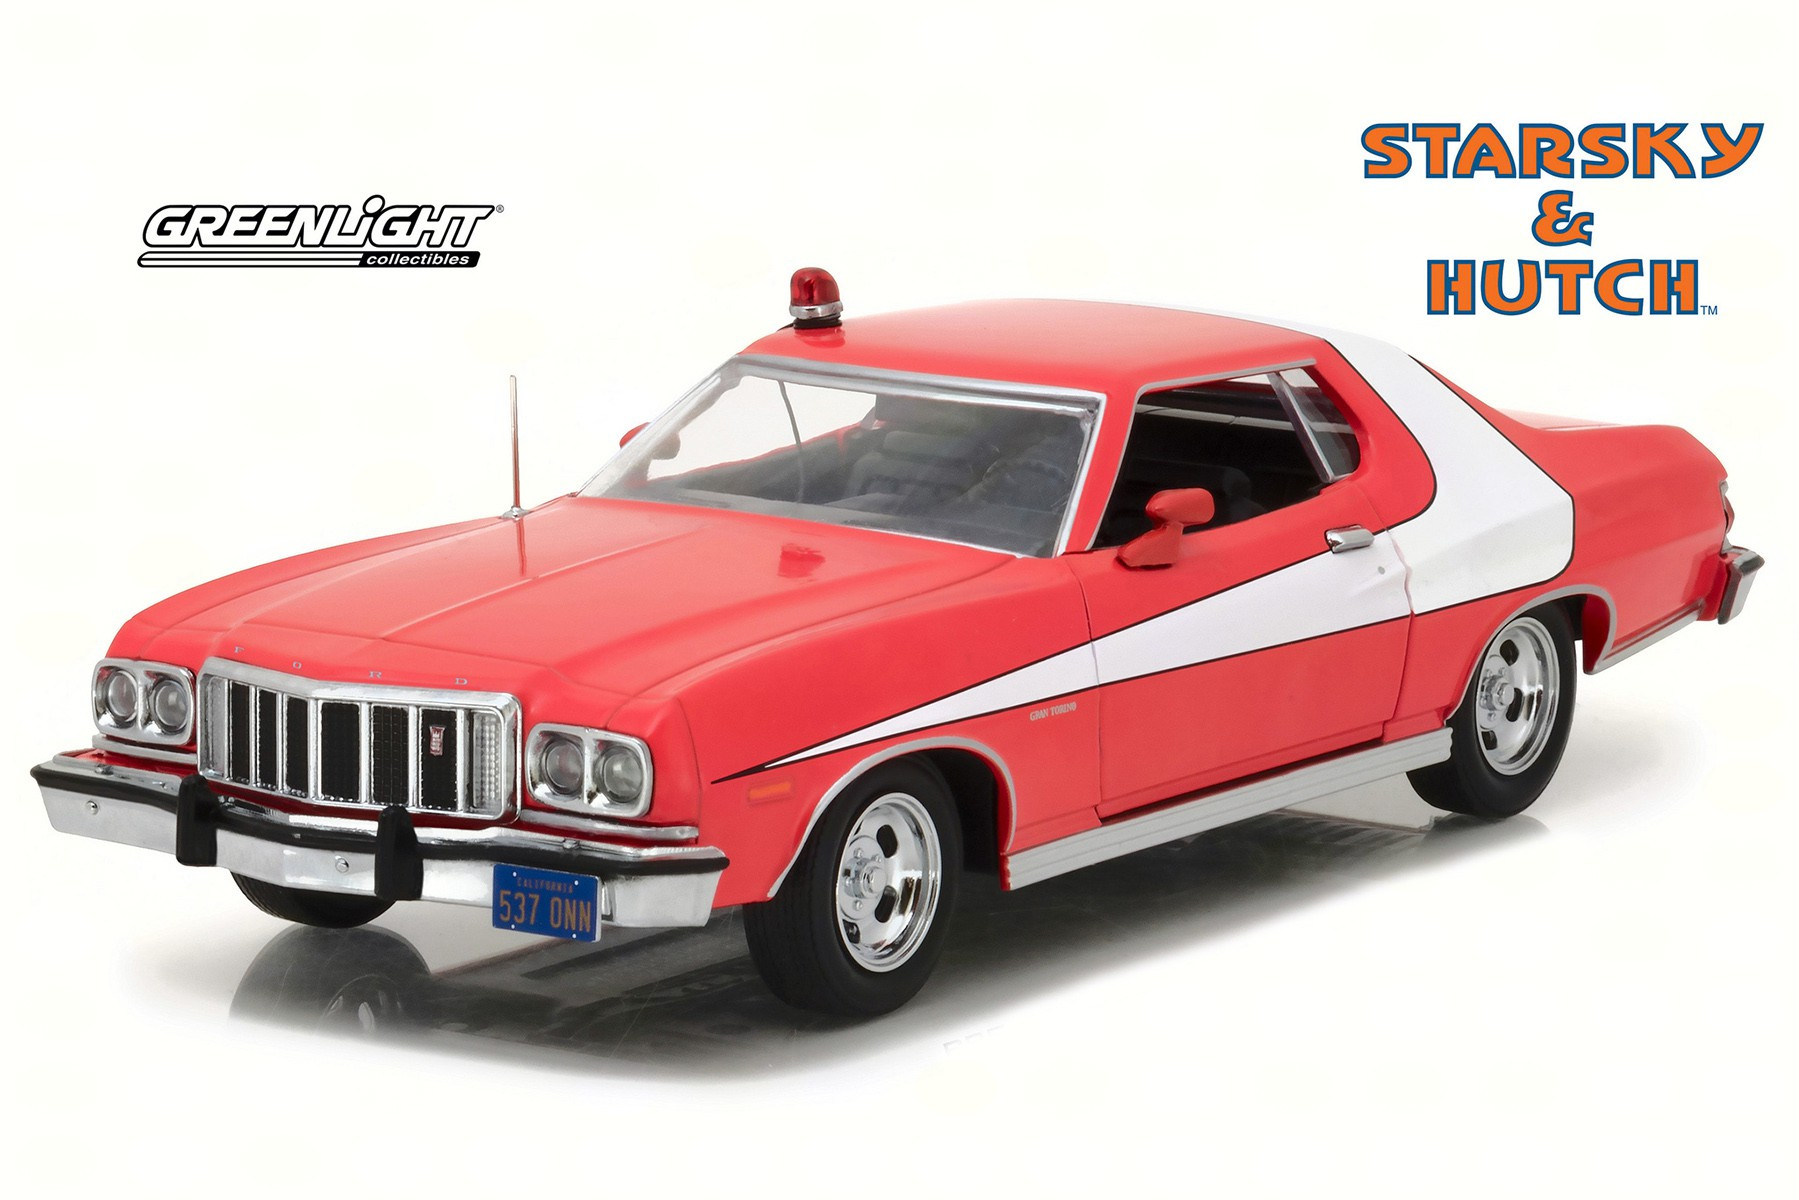 84042-gl-starsky-hutch-1976-grand-torino-124-1.jpg